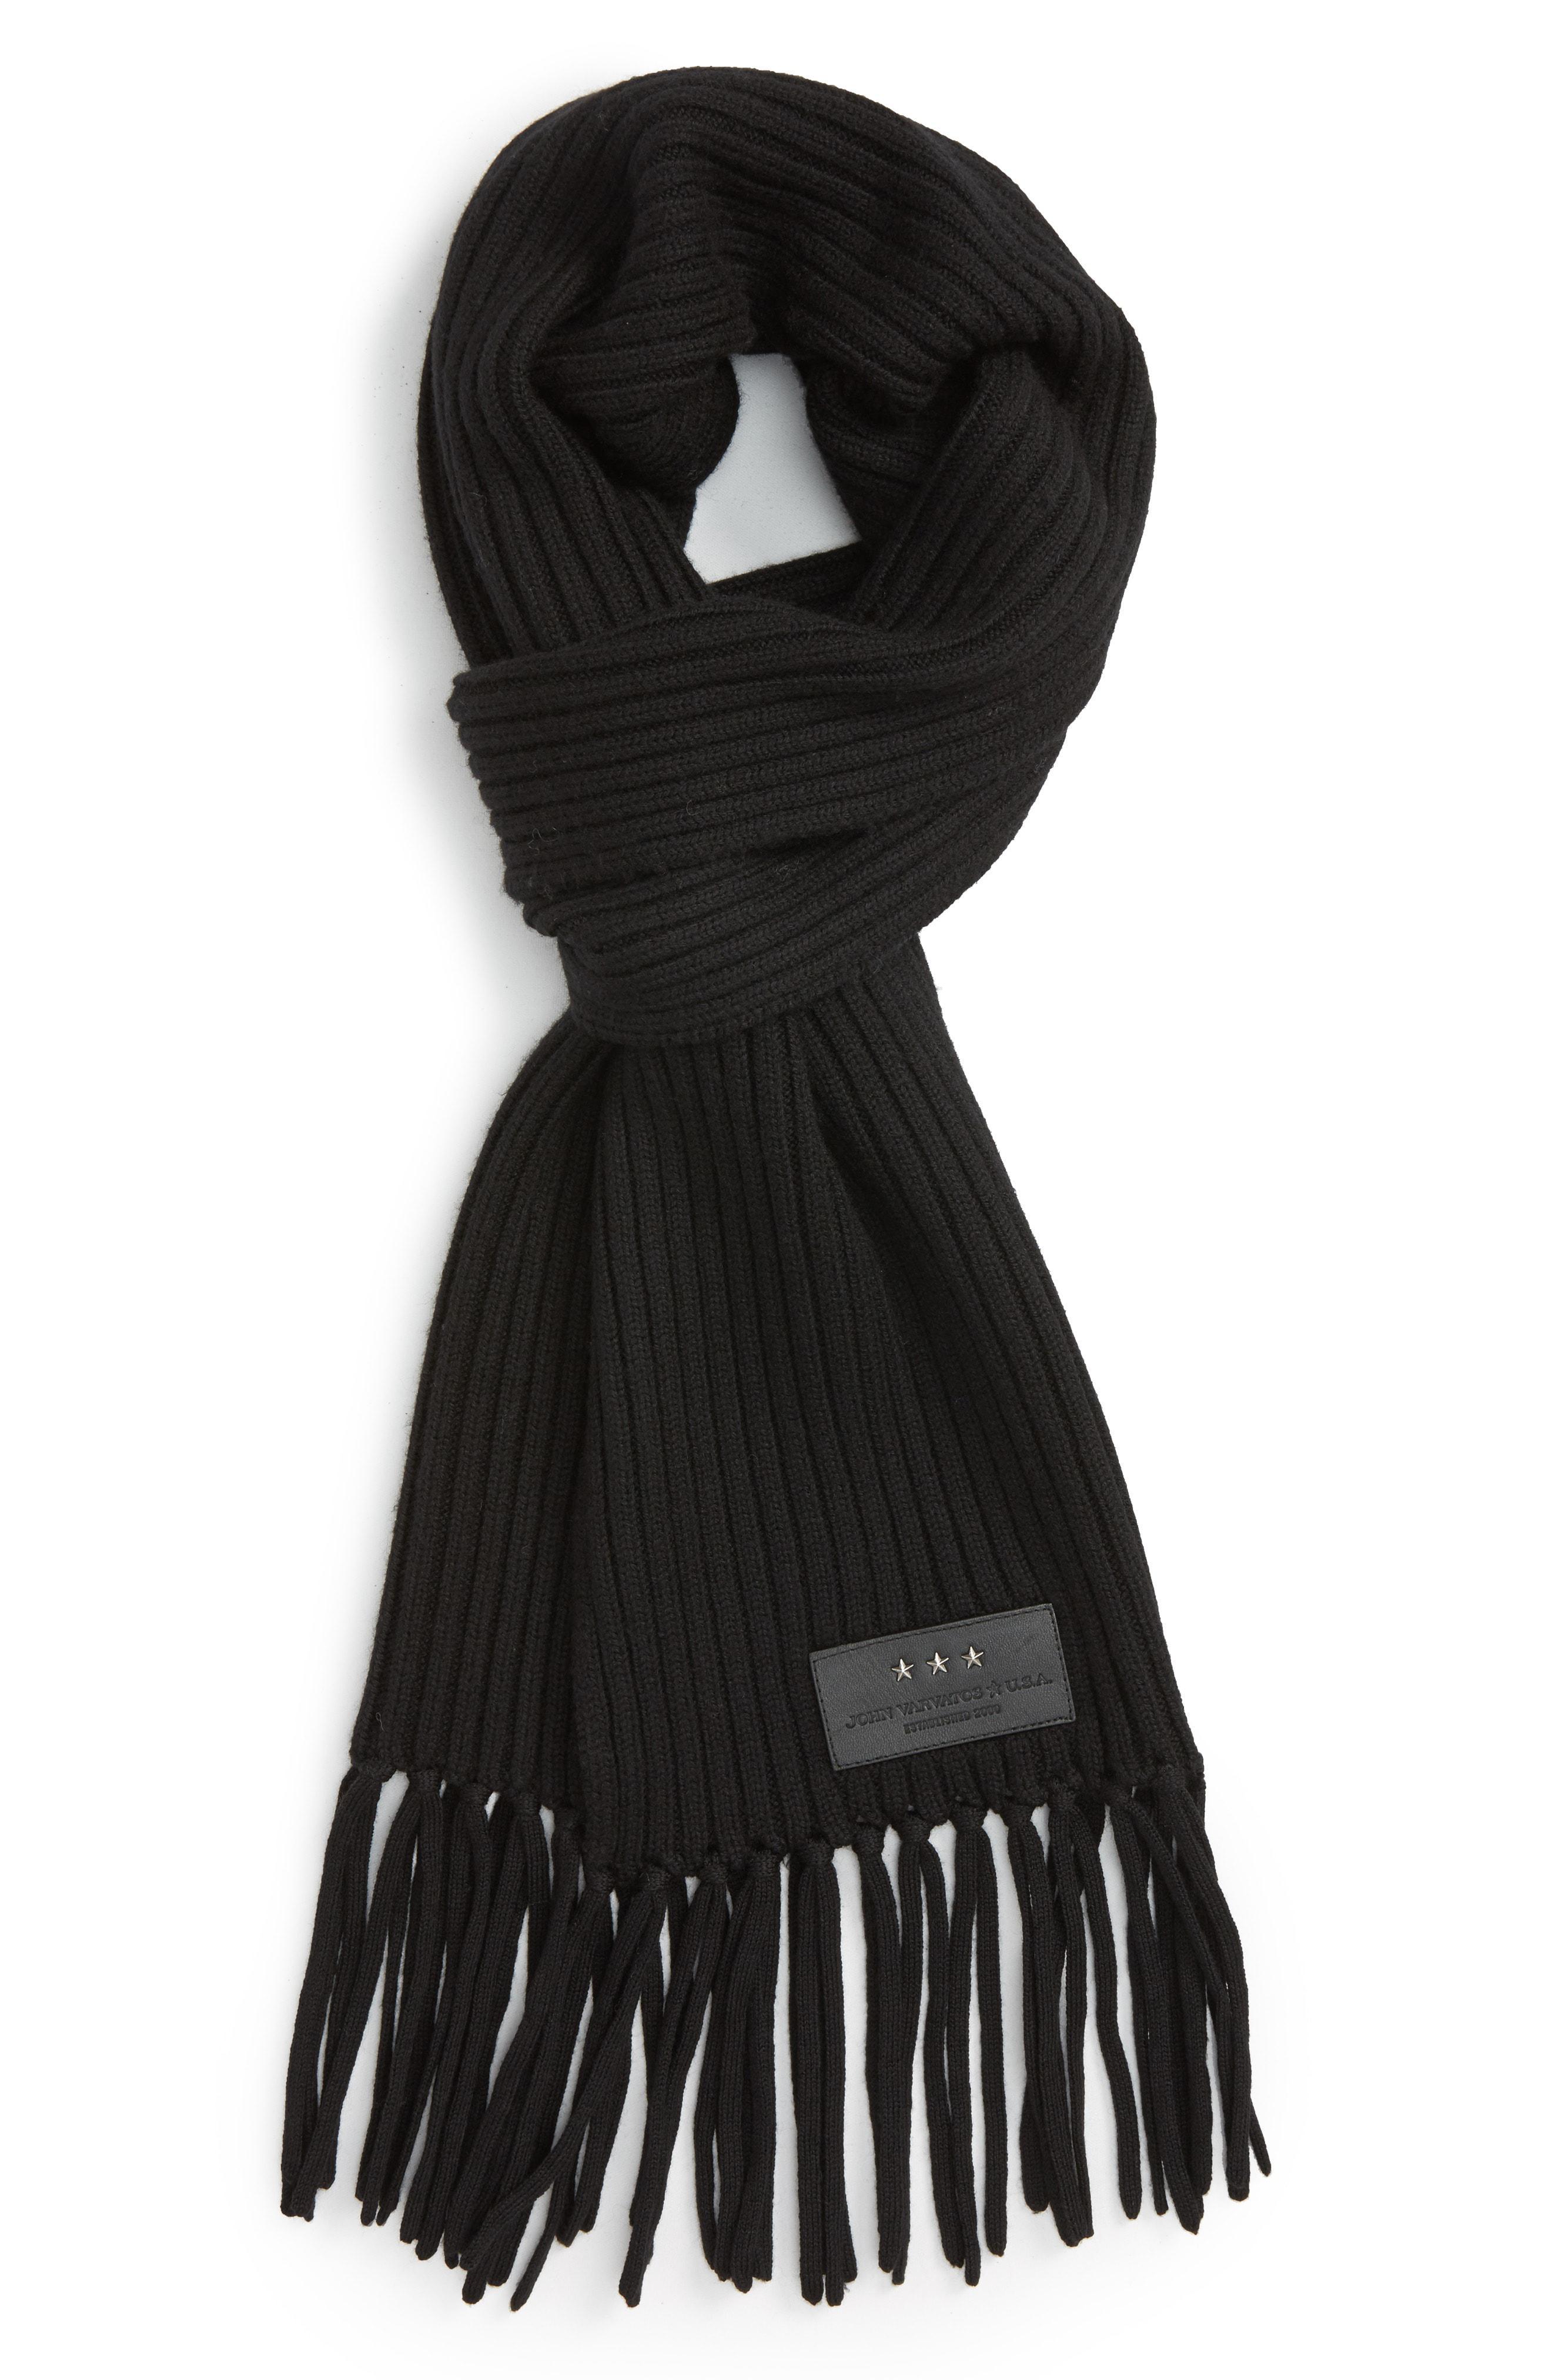 bf2e1c186e099 Lyst - John Varvatos Wool Scarf in Black for Men